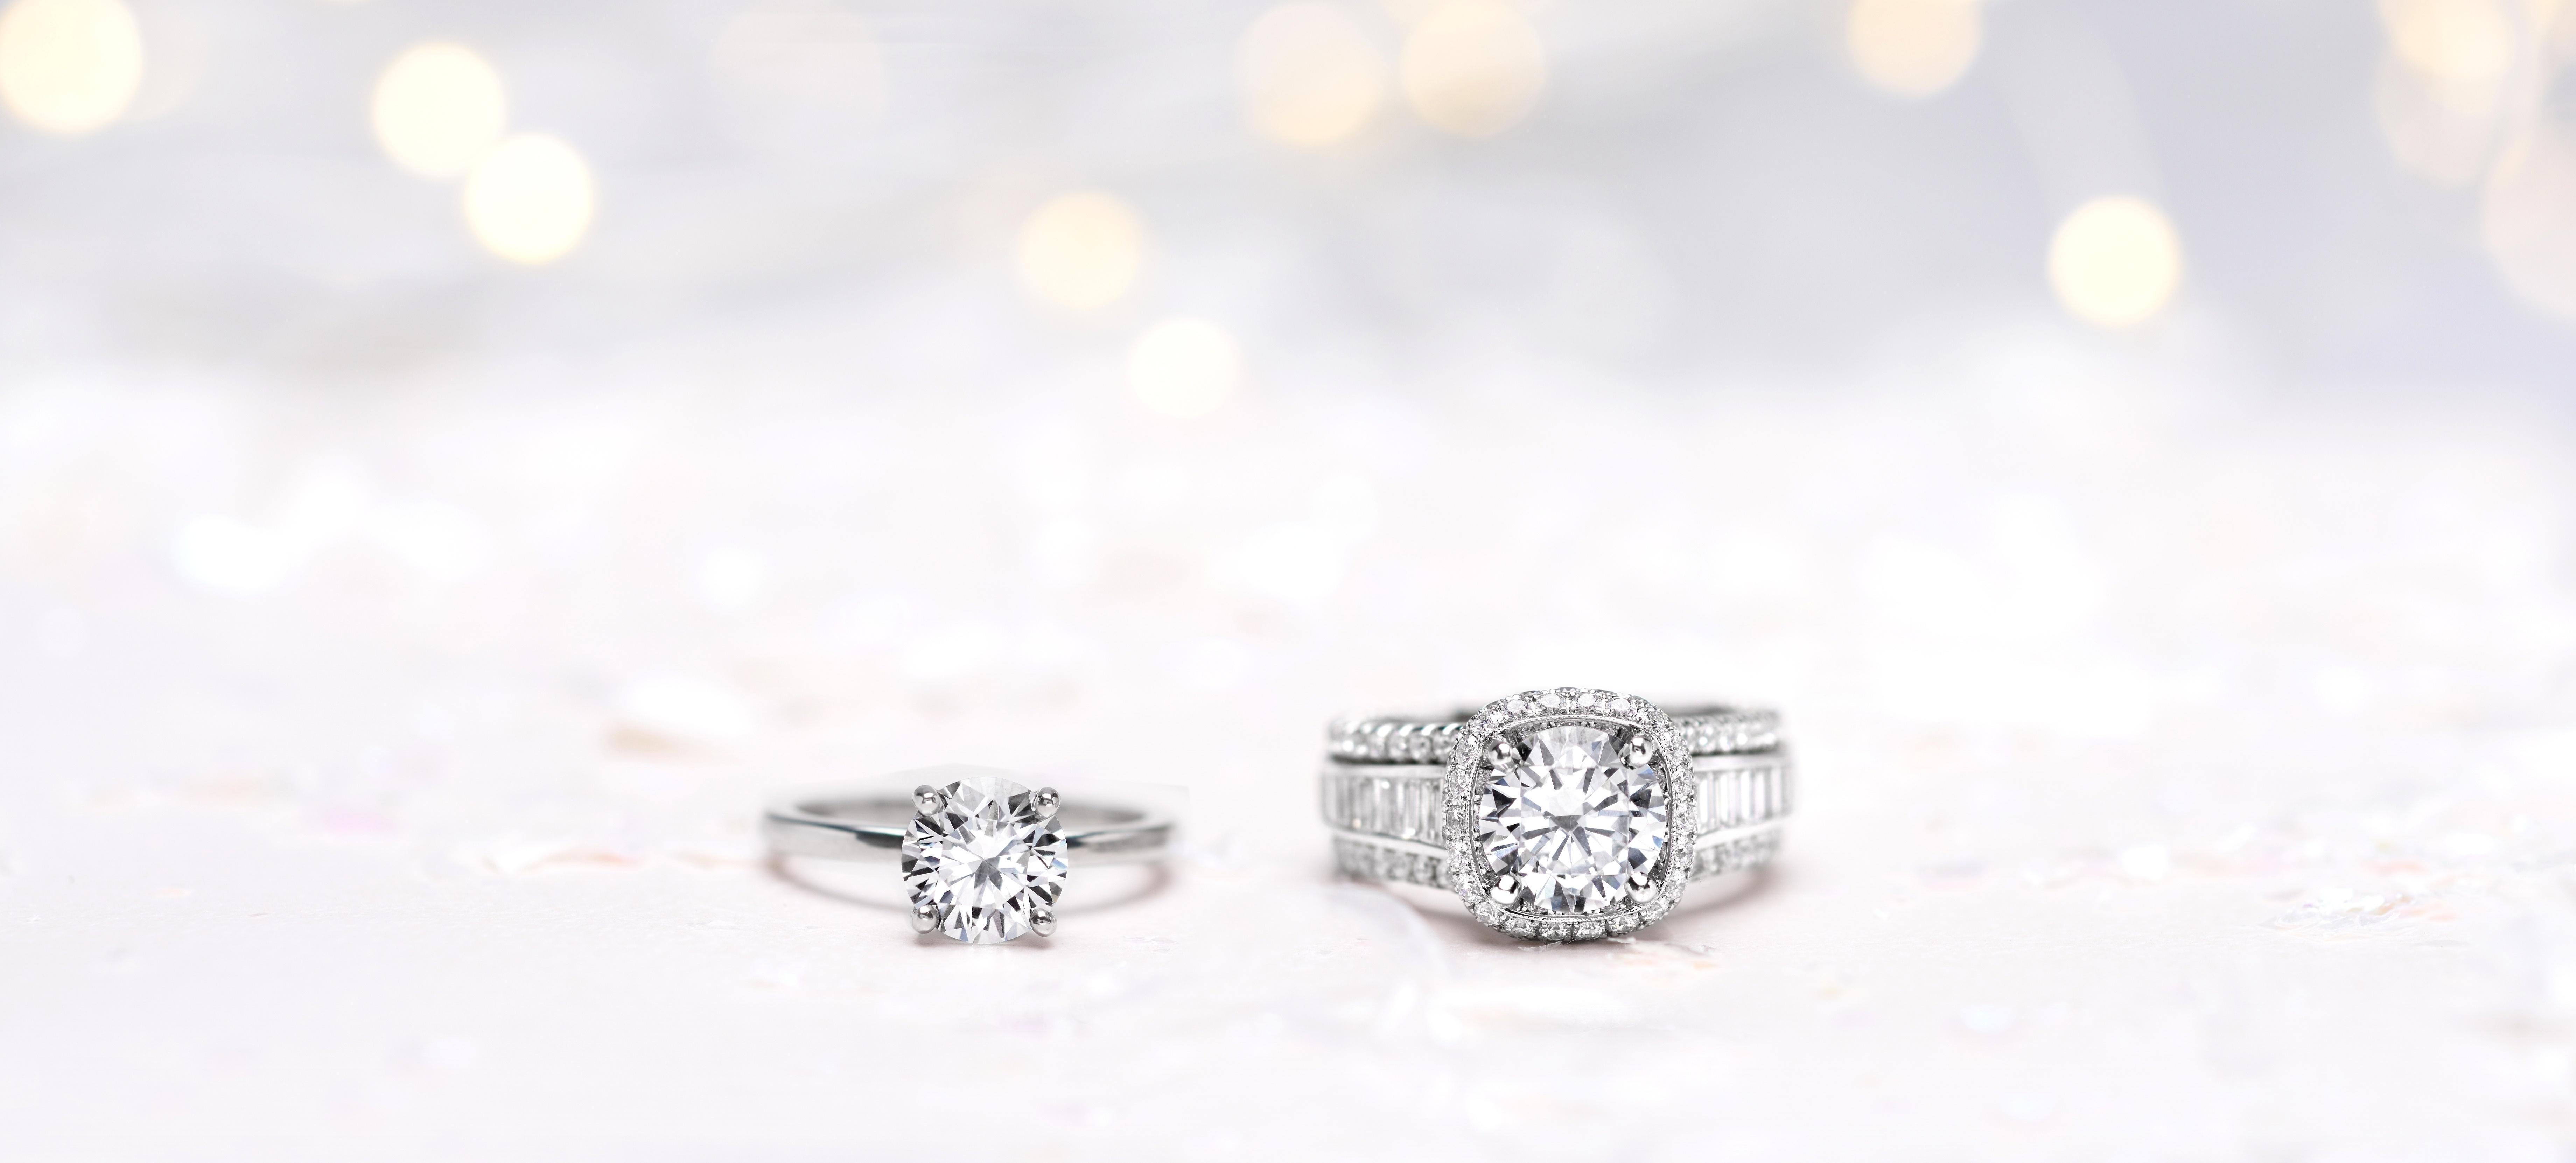 Engagement Ring Upgrades